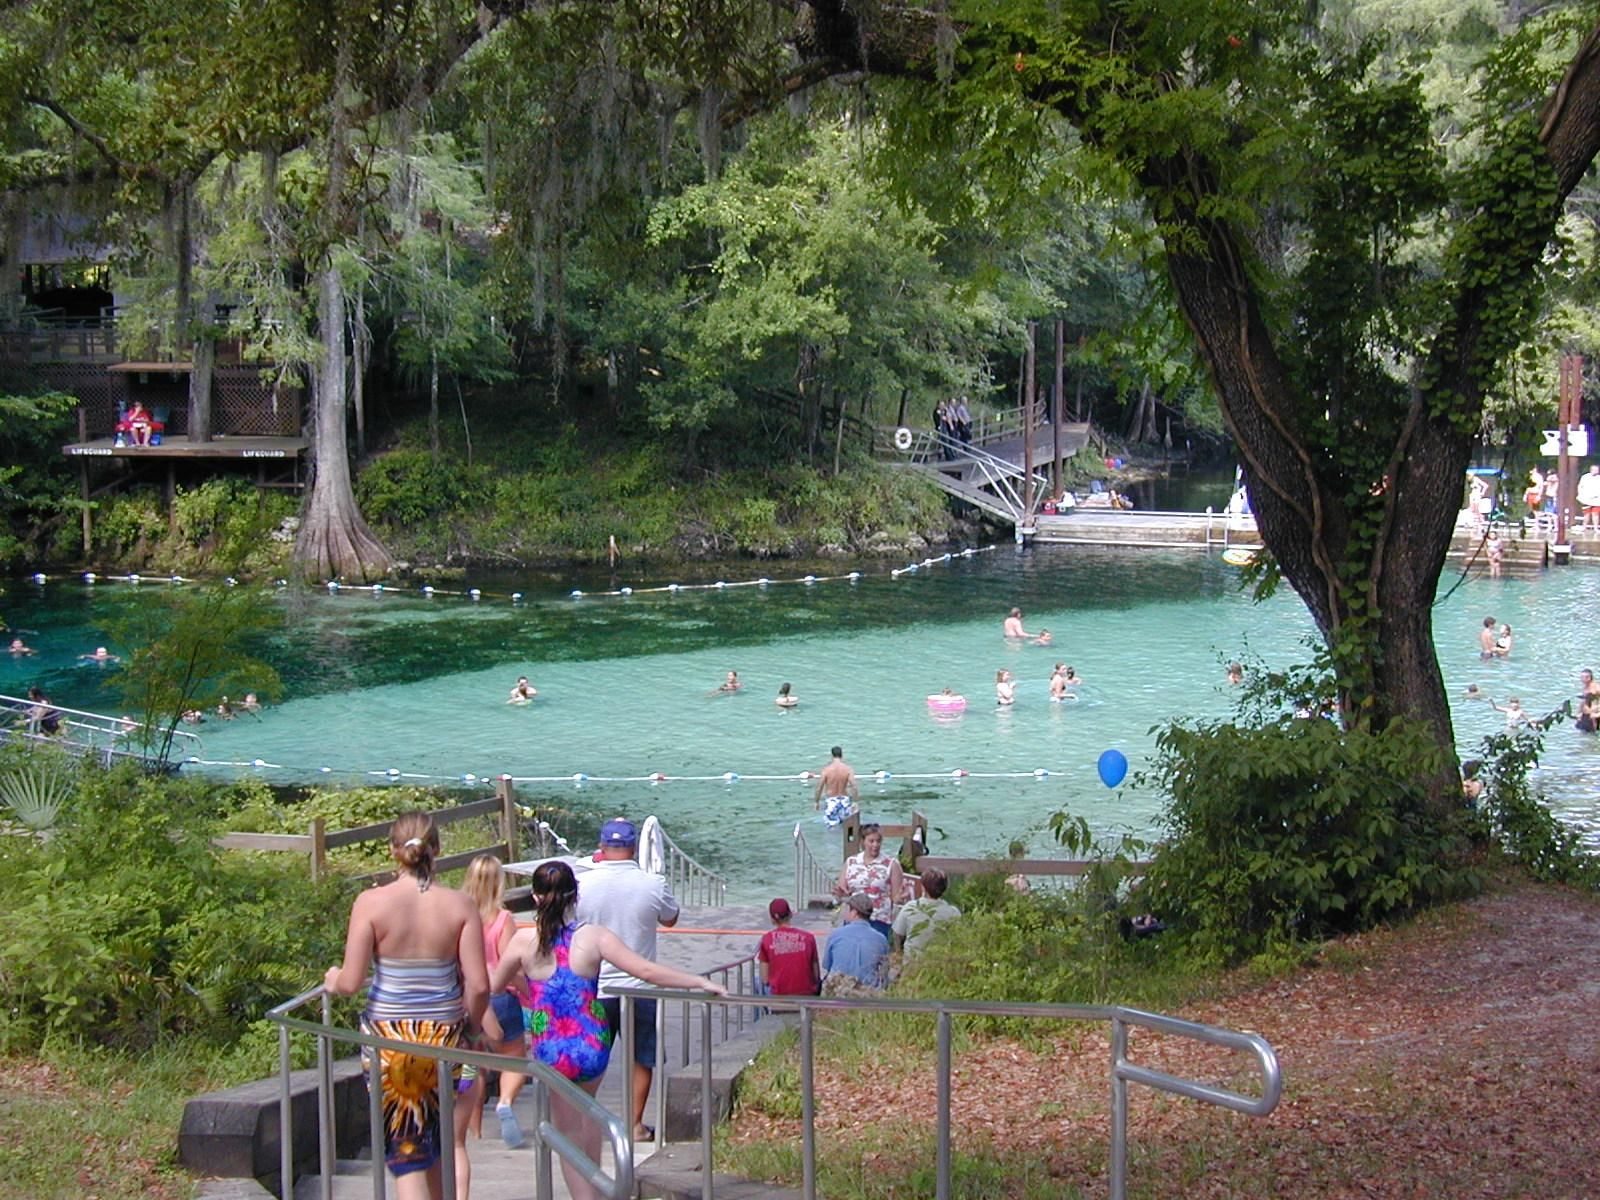 Florida Springs 19 Fanning Springs Fl 32693 Phone